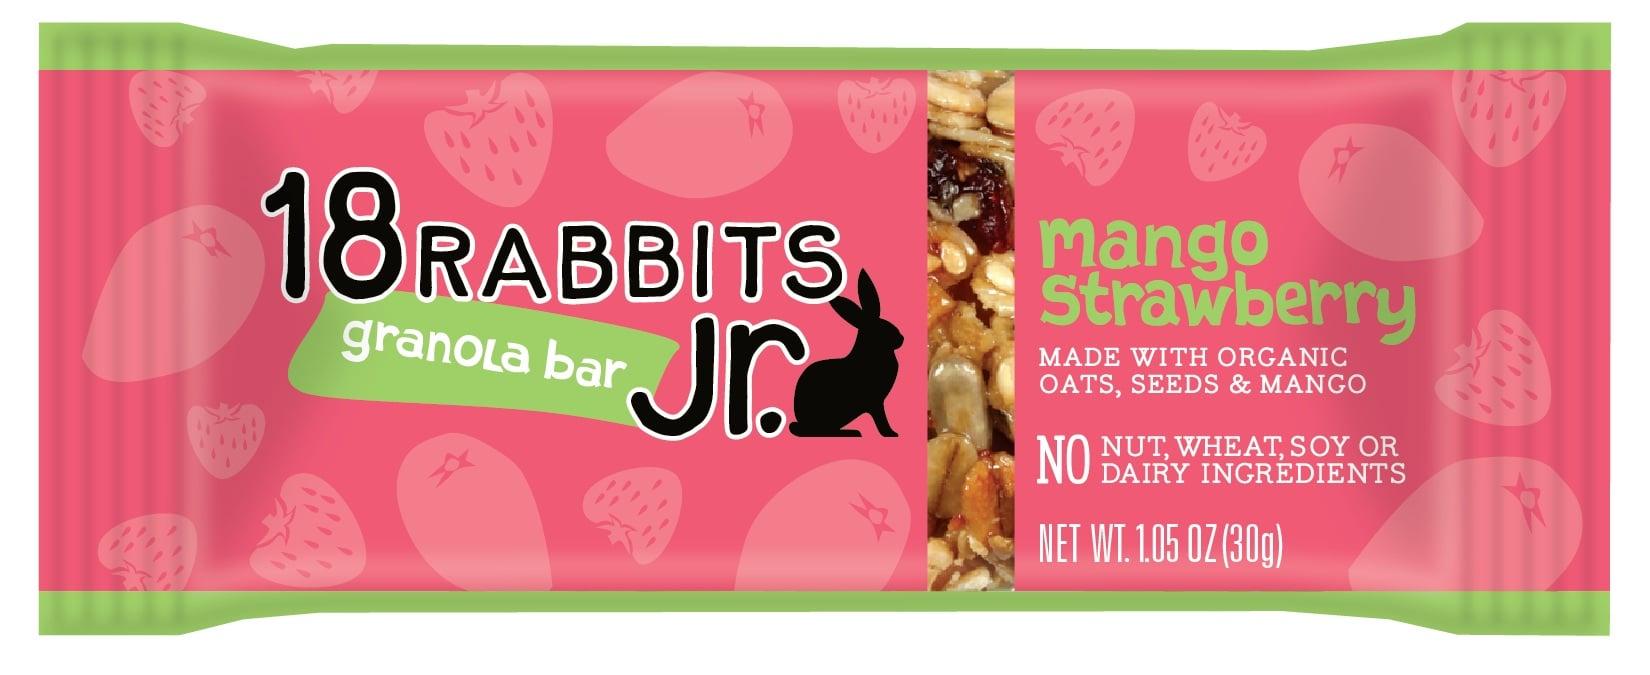 18 Rabbits Granola Bar